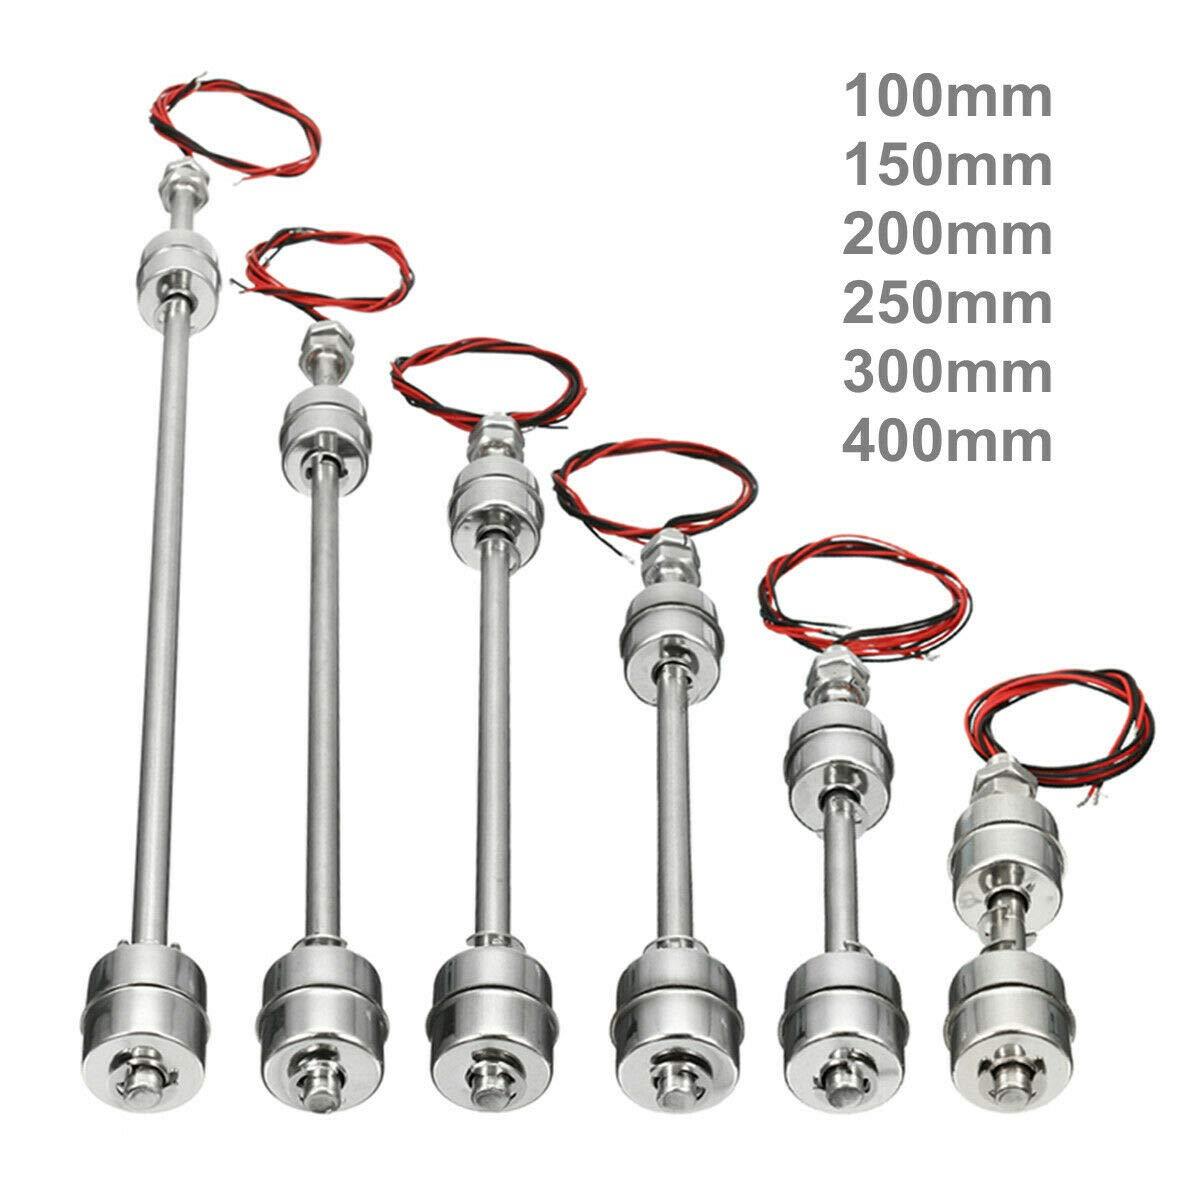 Montaje Vertical Acero Inoxidable Sensor de Nivel de Agua 1 Interruptor Flotante Interruptor de Flotador es una Estructura Simple para detectar el Nivel de l/íquido en un dep/ósito.